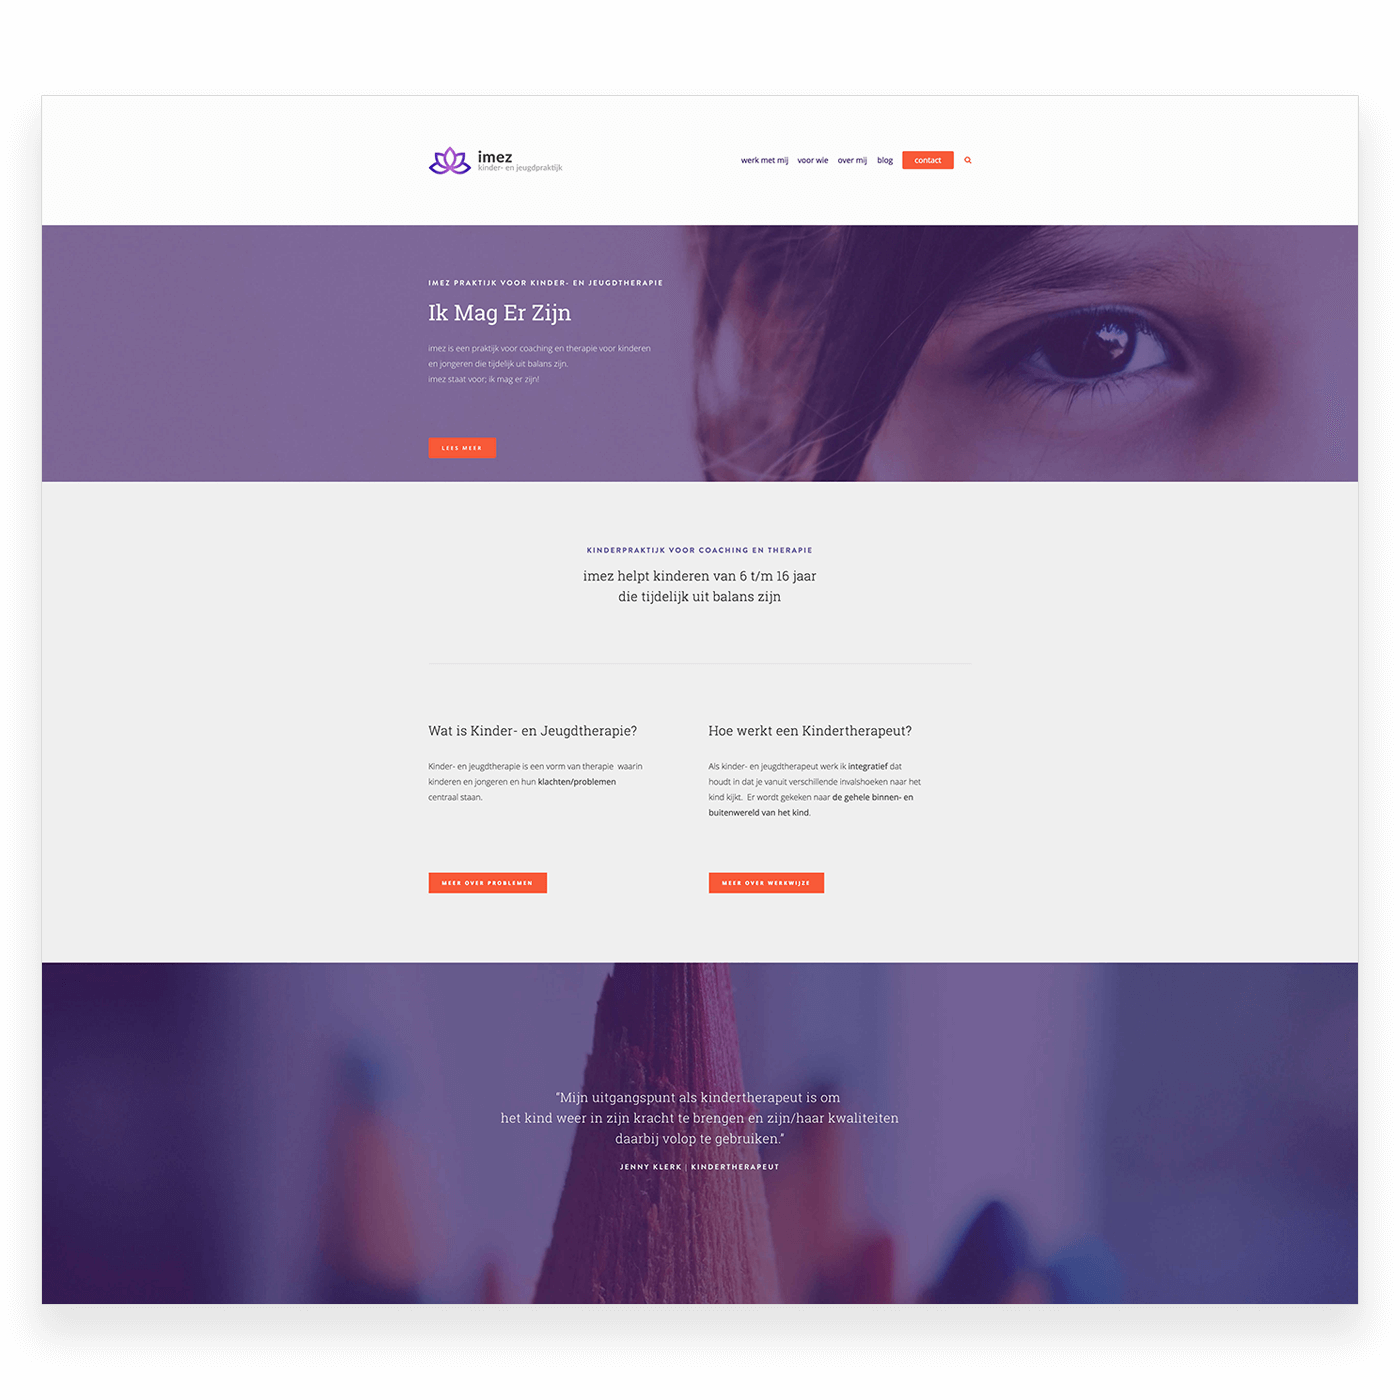 imez_website.png